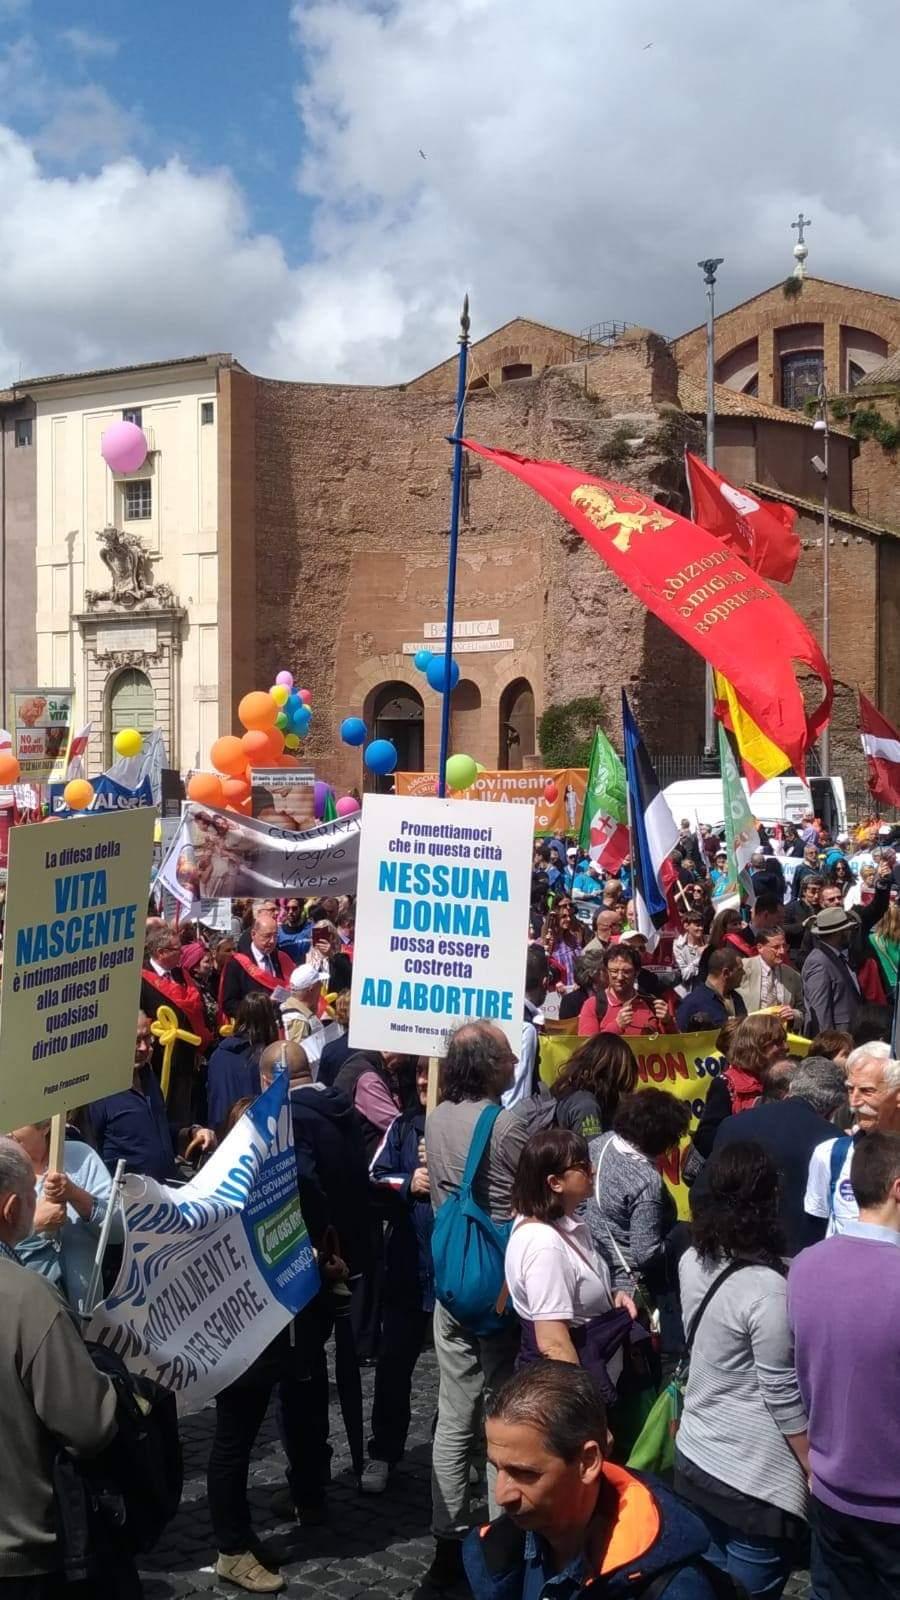 Marcha pela Vida - Roma 18/5/2019